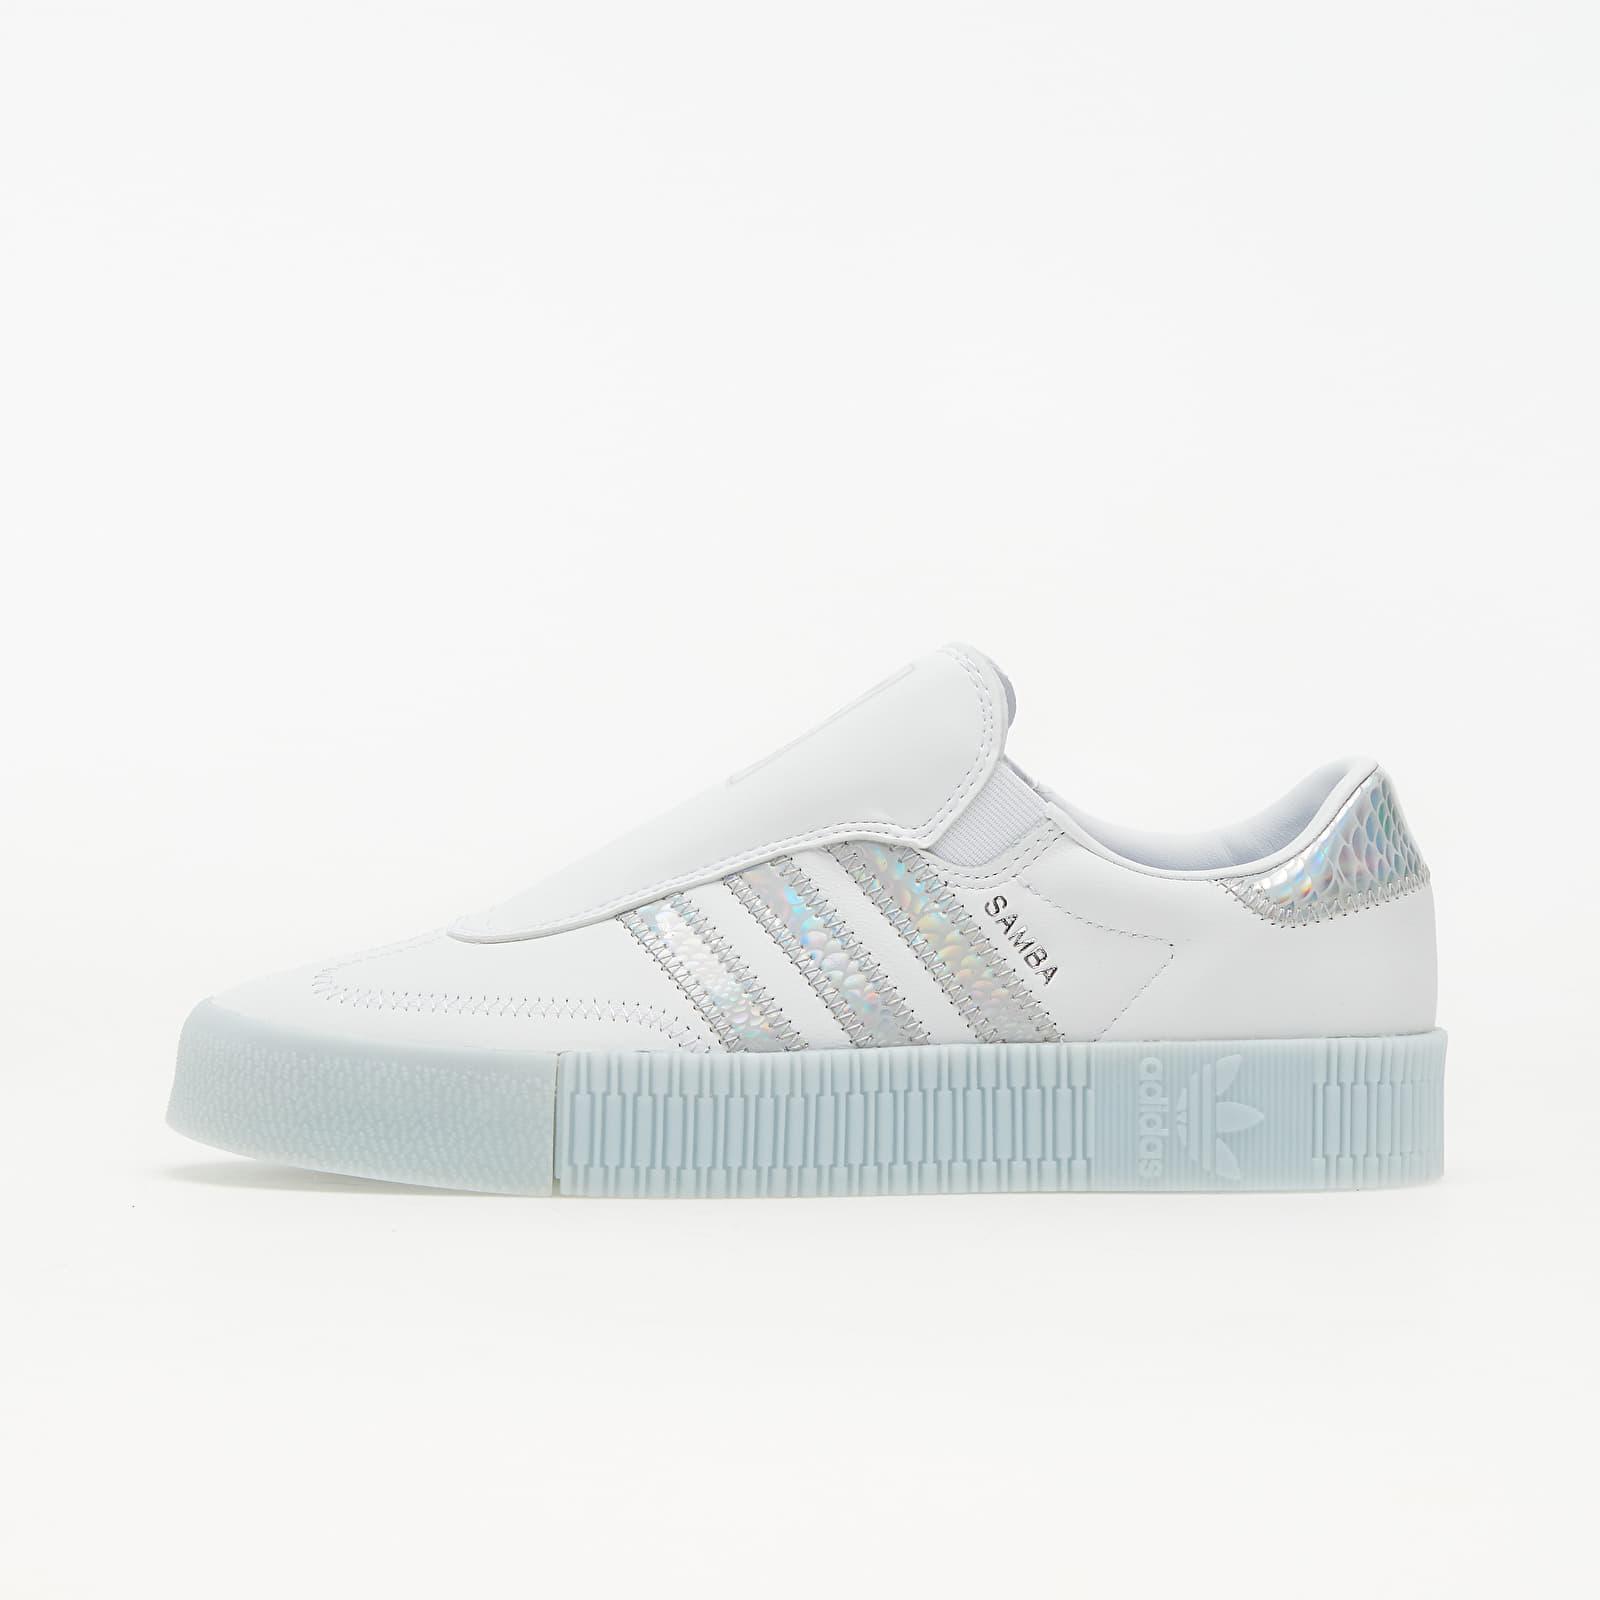 adidas Sambarose Eazy W Ftw White/ Supplier Color/ Halo Blue EUR 39 1/3